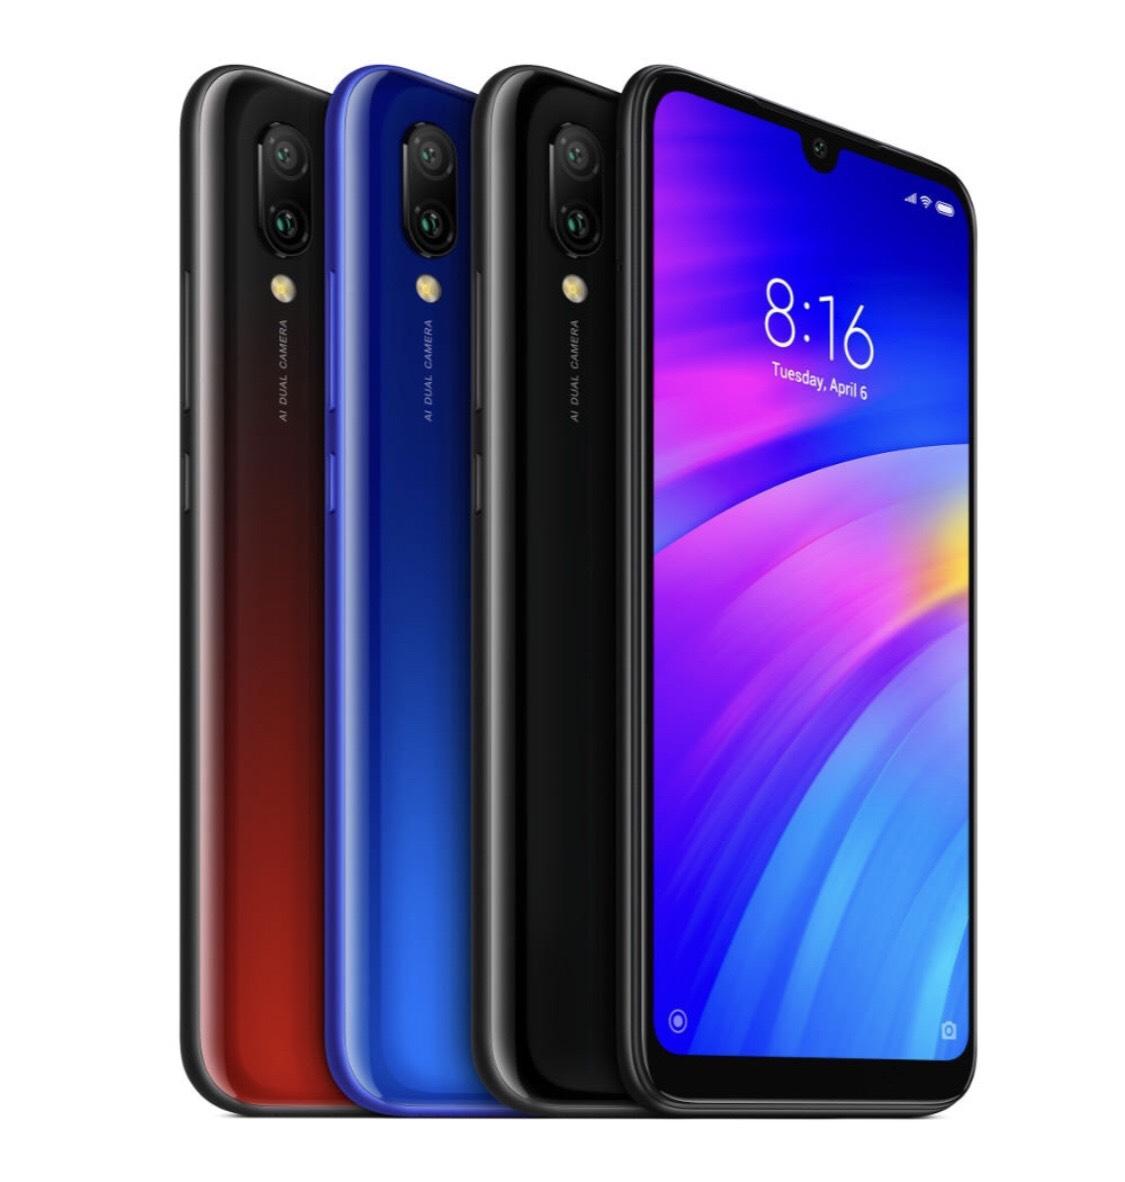 Xiaomi Redmi 7 Global Version 6.26 inch Dual Rear Camera 2GB RAM 16GB ROM Snapdragon 632 Octa core 4G Smartphone Black